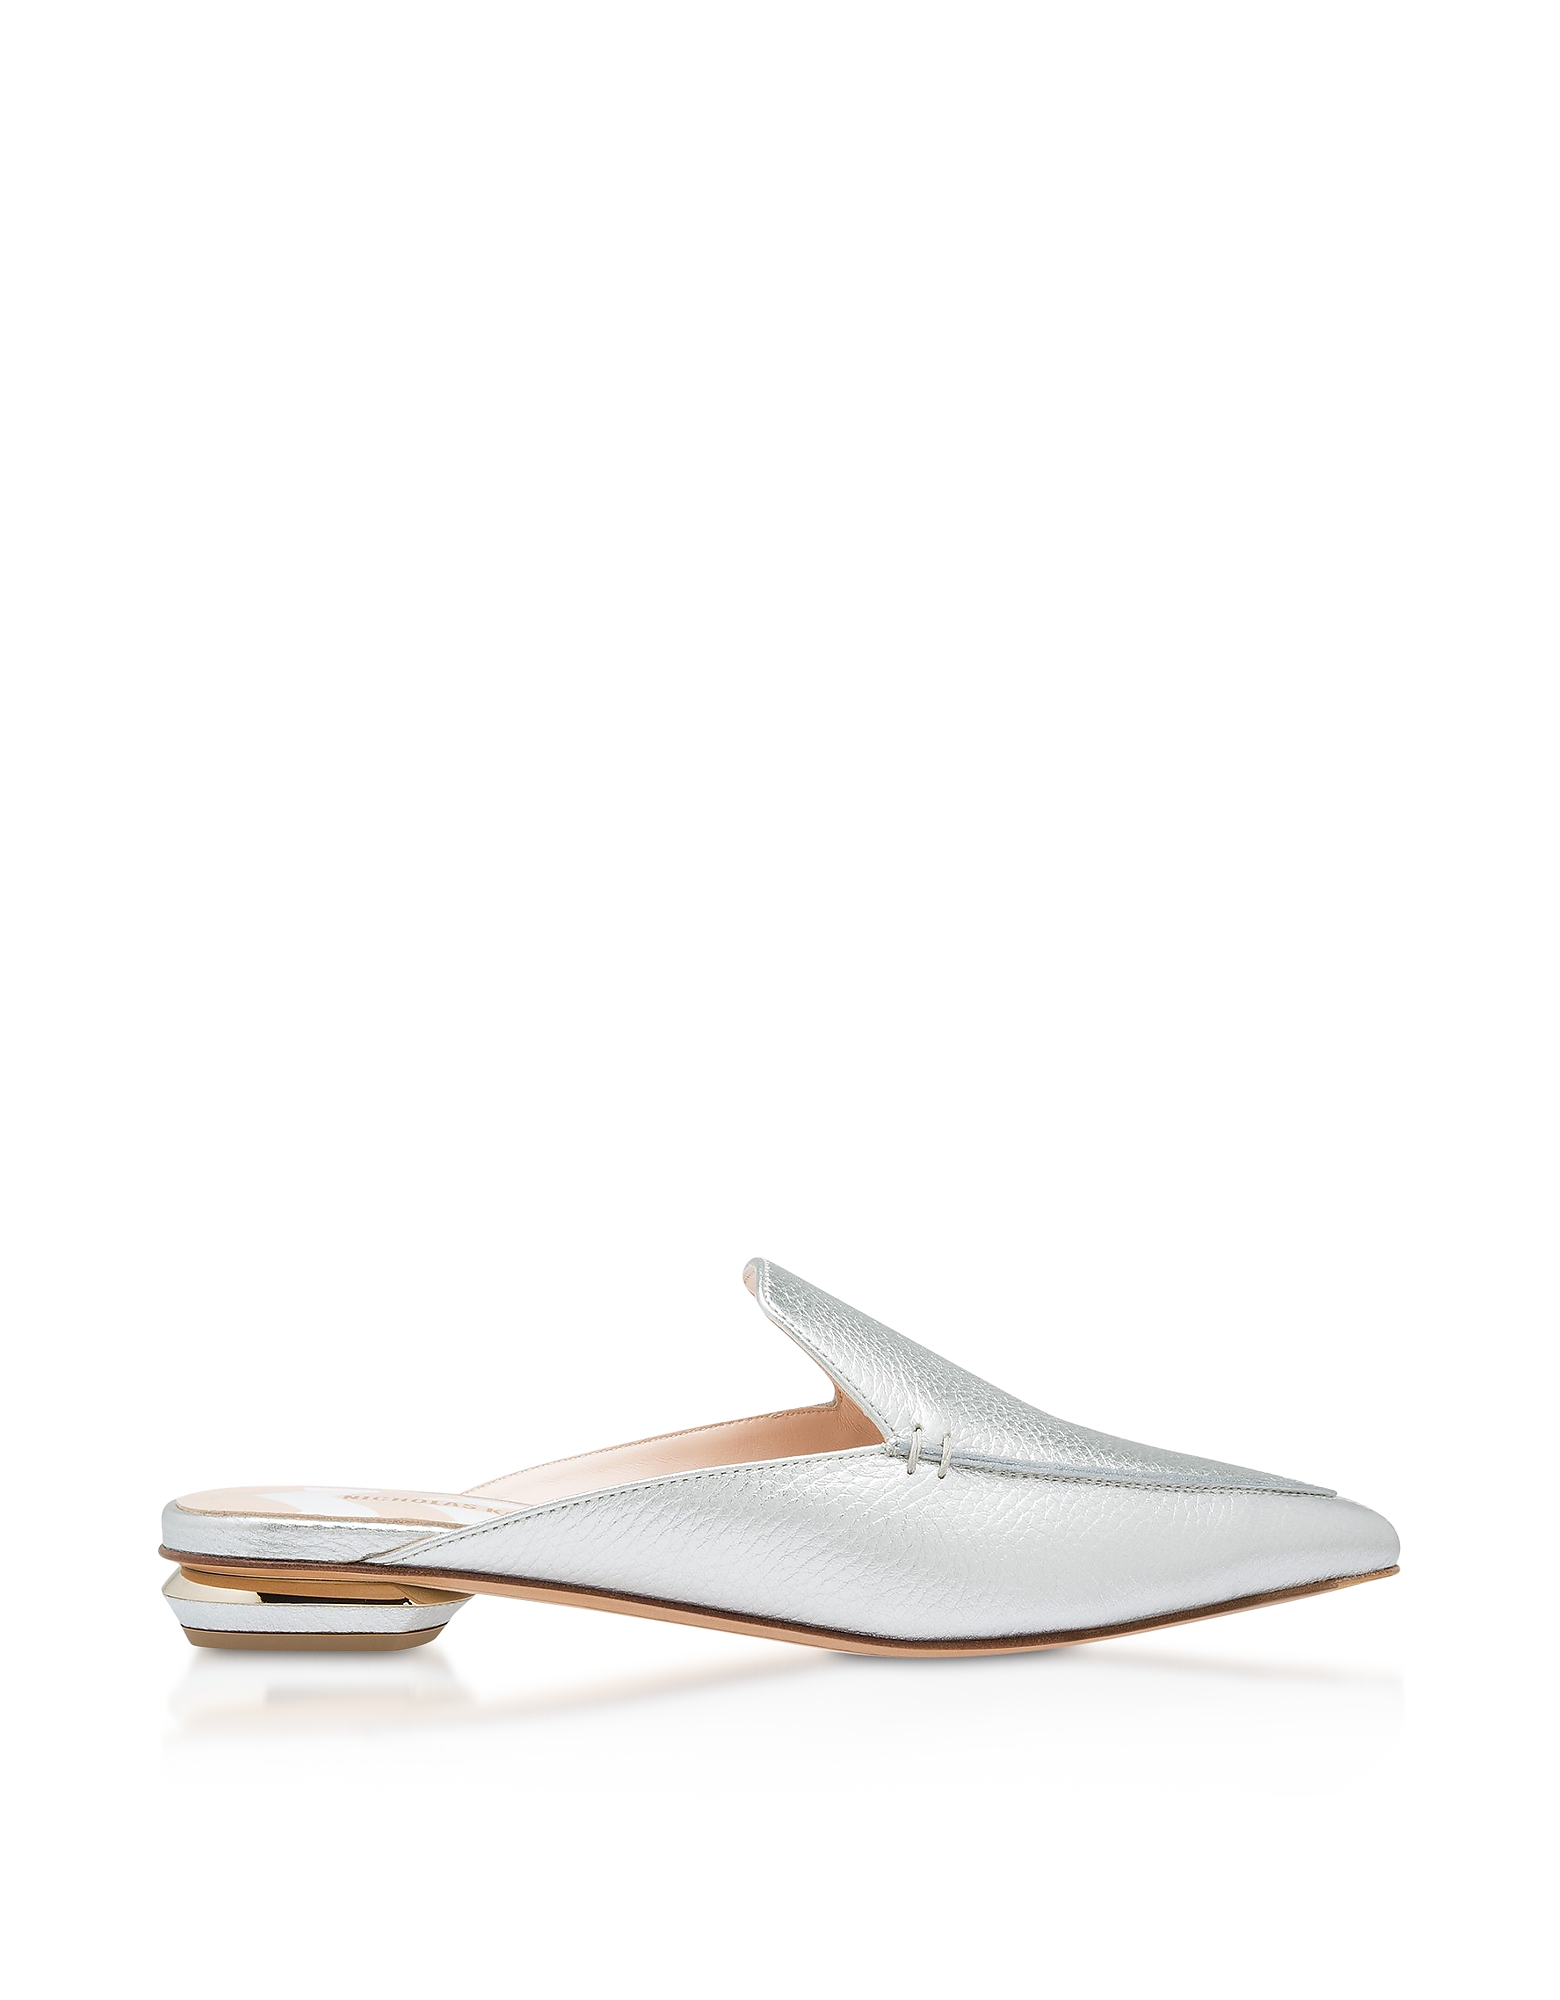 Nicholas Kirkwood Designer Shoes, Metallic Silver Grainy 18mm Beya Flat Mules